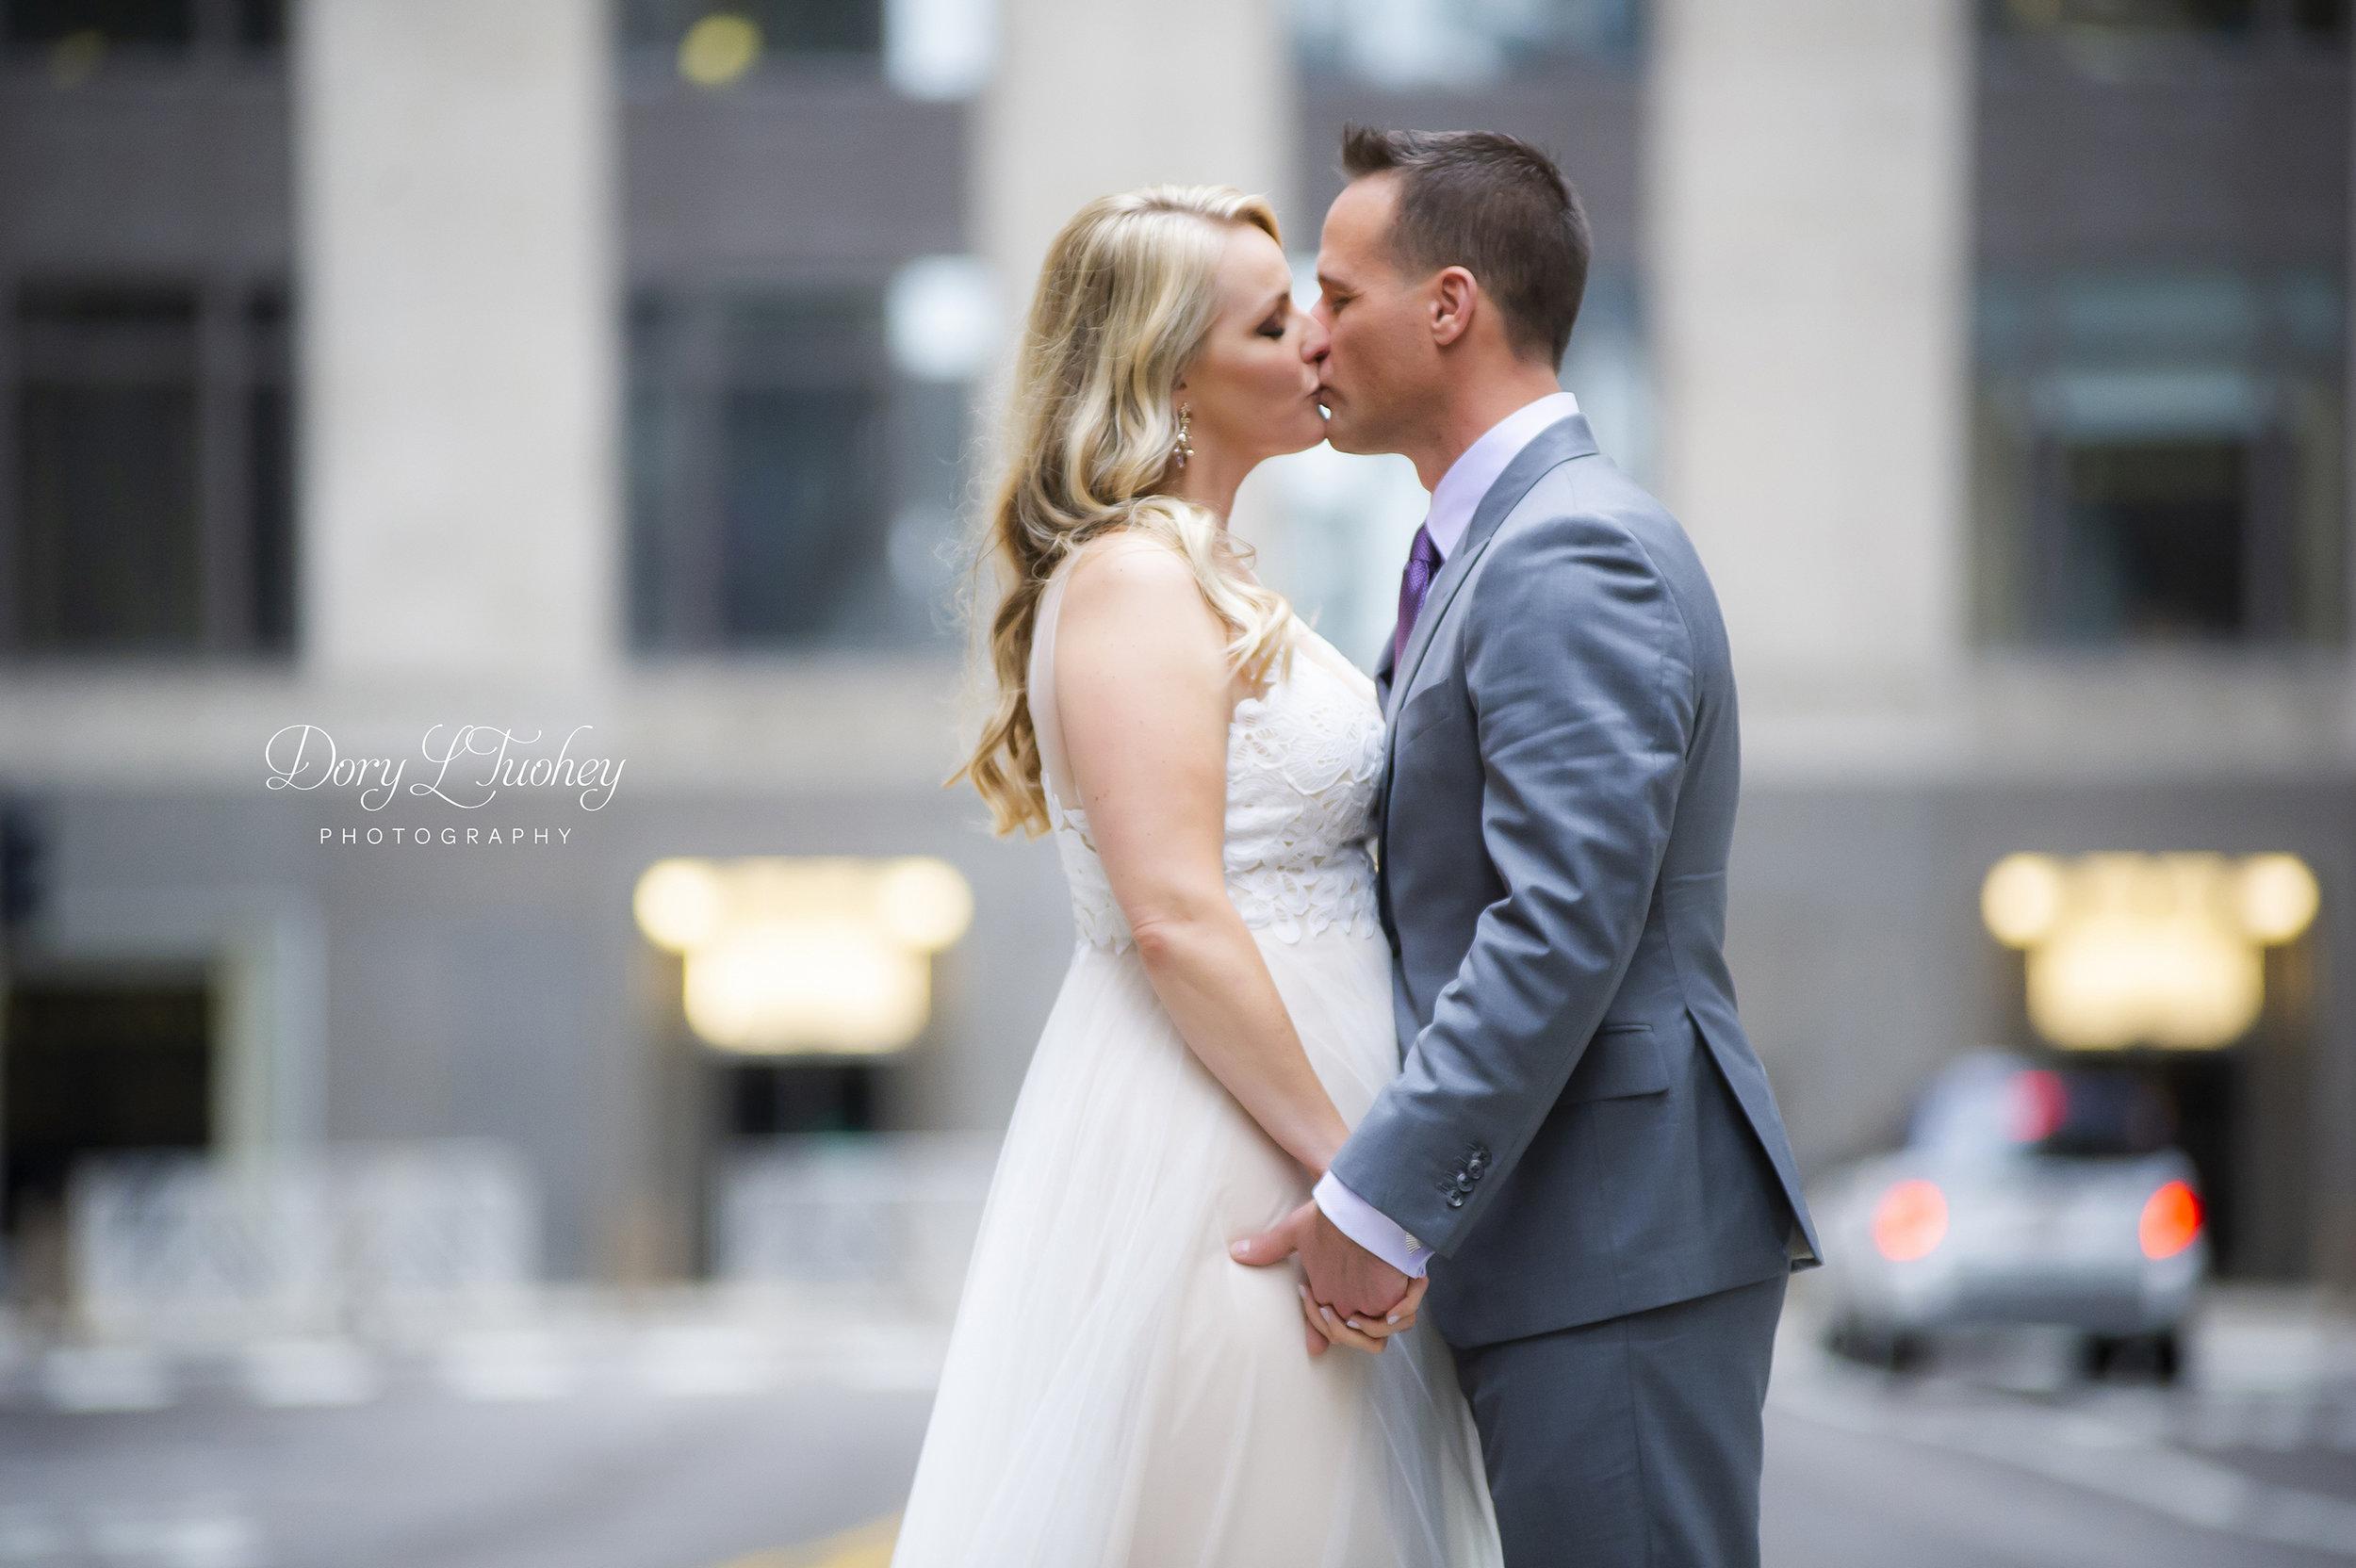 Rookery_chicago_dory_photographer_wedding_stairs_bhldn_love_dawson_06.jpg